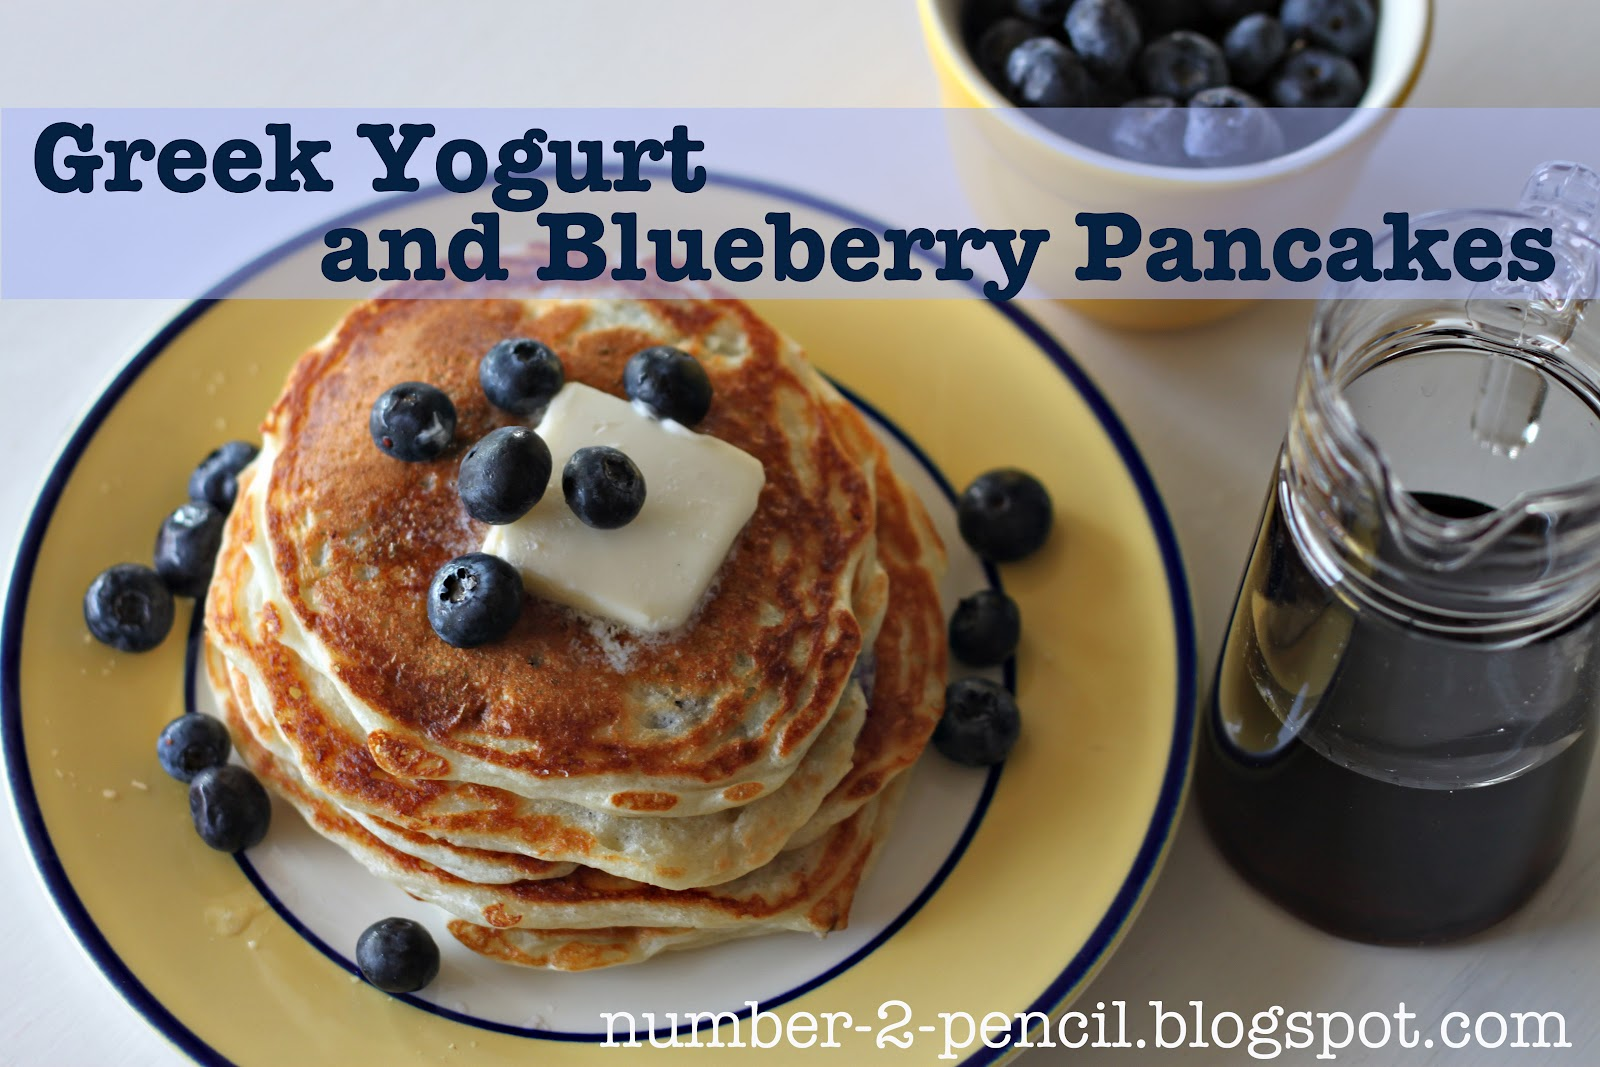 Greek yogurt and blueberry pancakes no 2 pencil ccuart Images